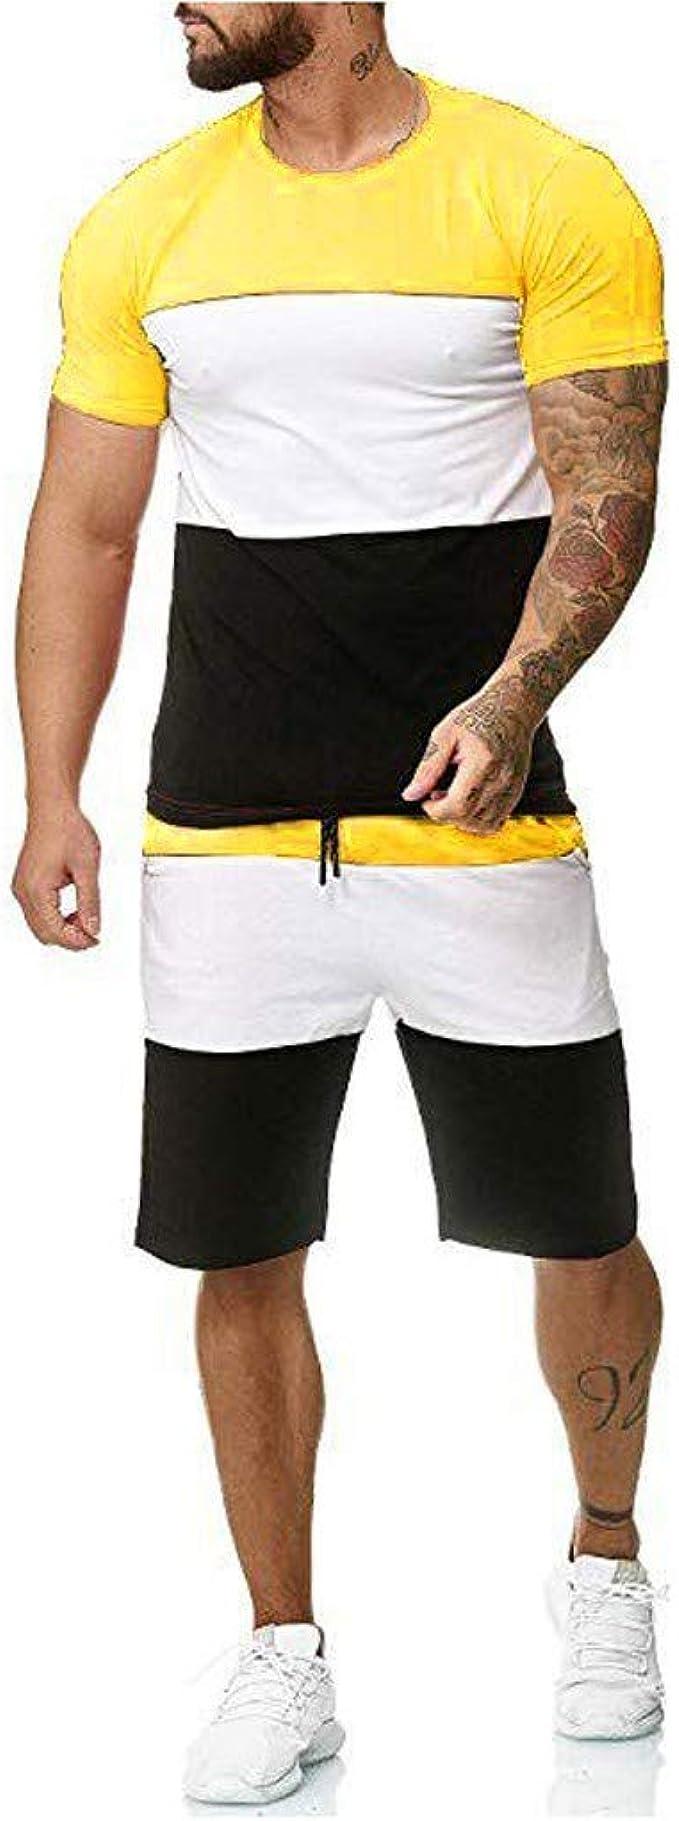 xzbailisha Mens Solid Elastic Waist Drawstring Casual Short Jogger Gym Shorts